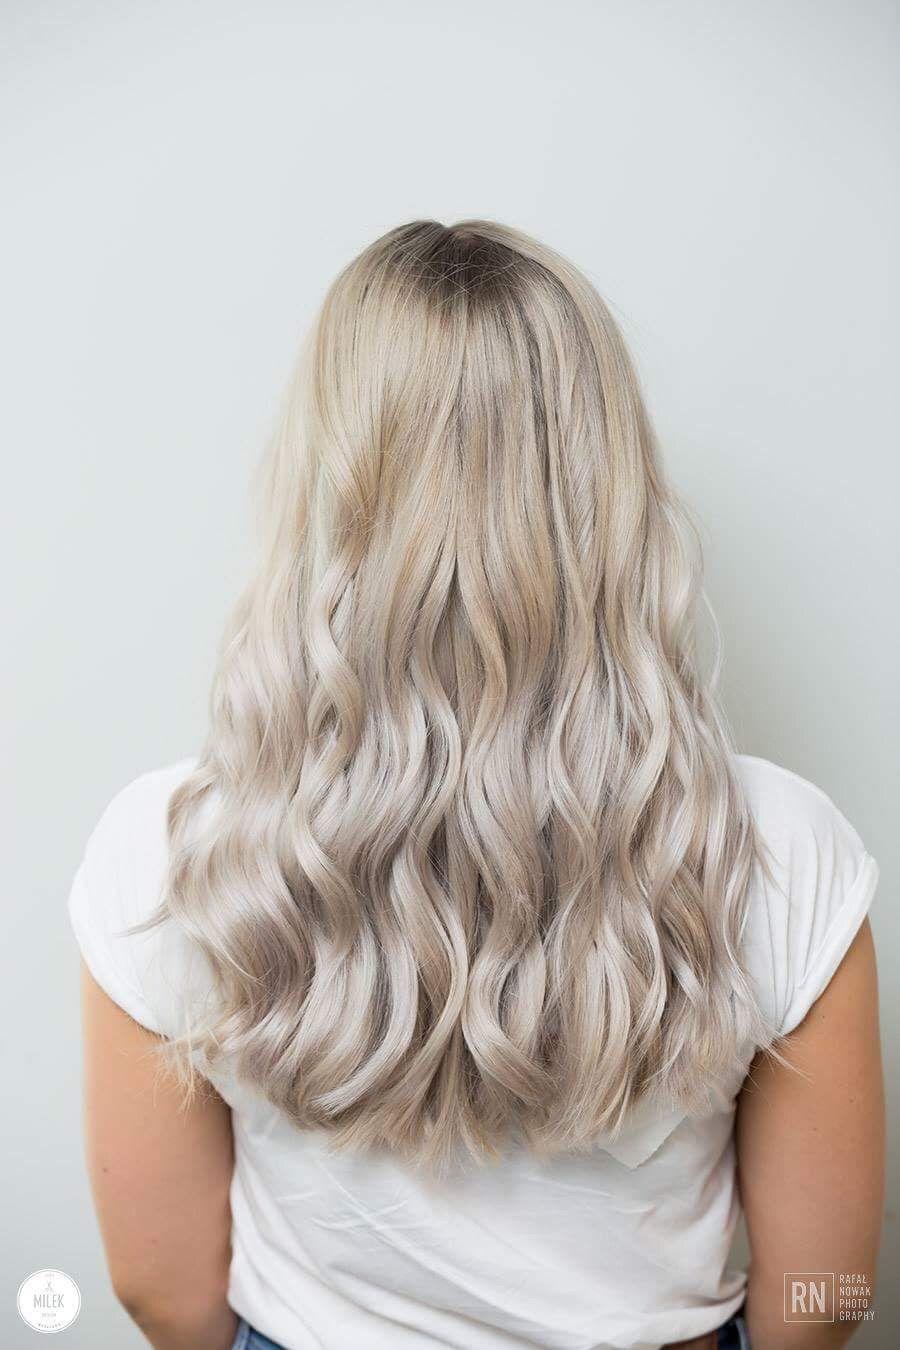 Chłodny zimny blond w 2019